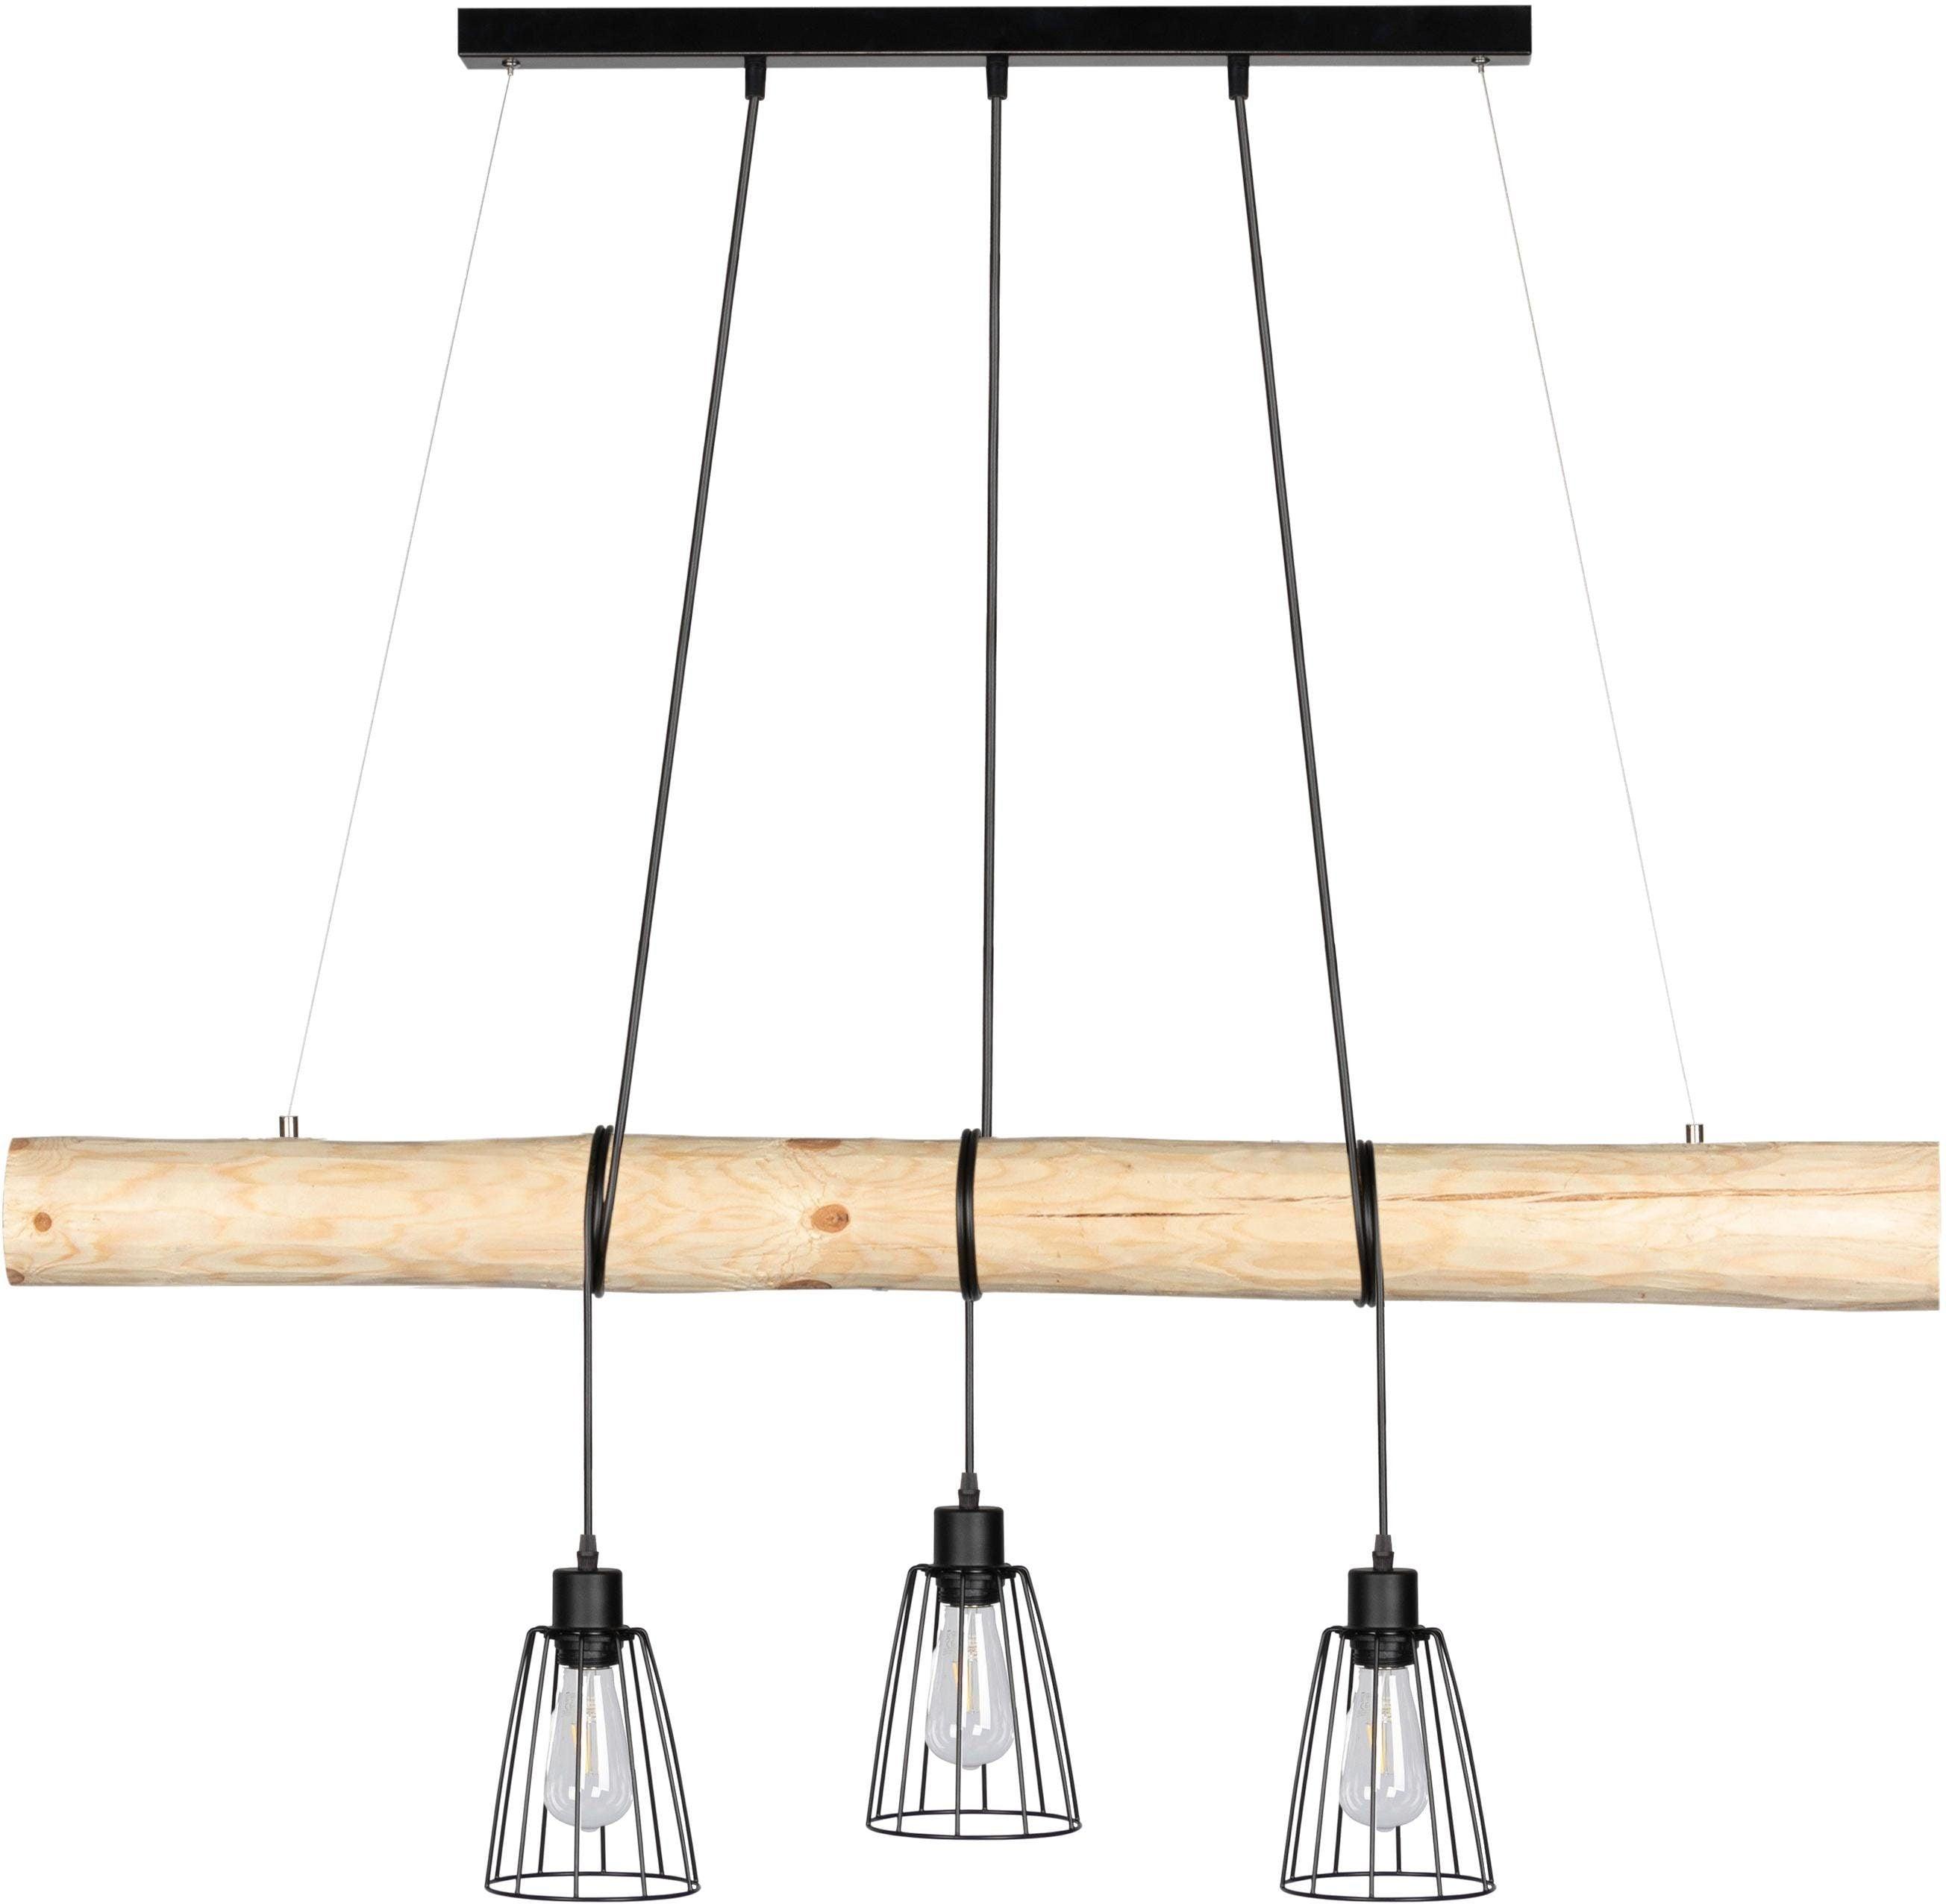 SPOT Light Pendelleuchte TRABO, E27, Hängeleuchte, mit Massivholzbalken Ø 8-12 cm, Naturprodukt mit FSC-zertifikat, Kürzbar, passende LM E27, Made in Europe